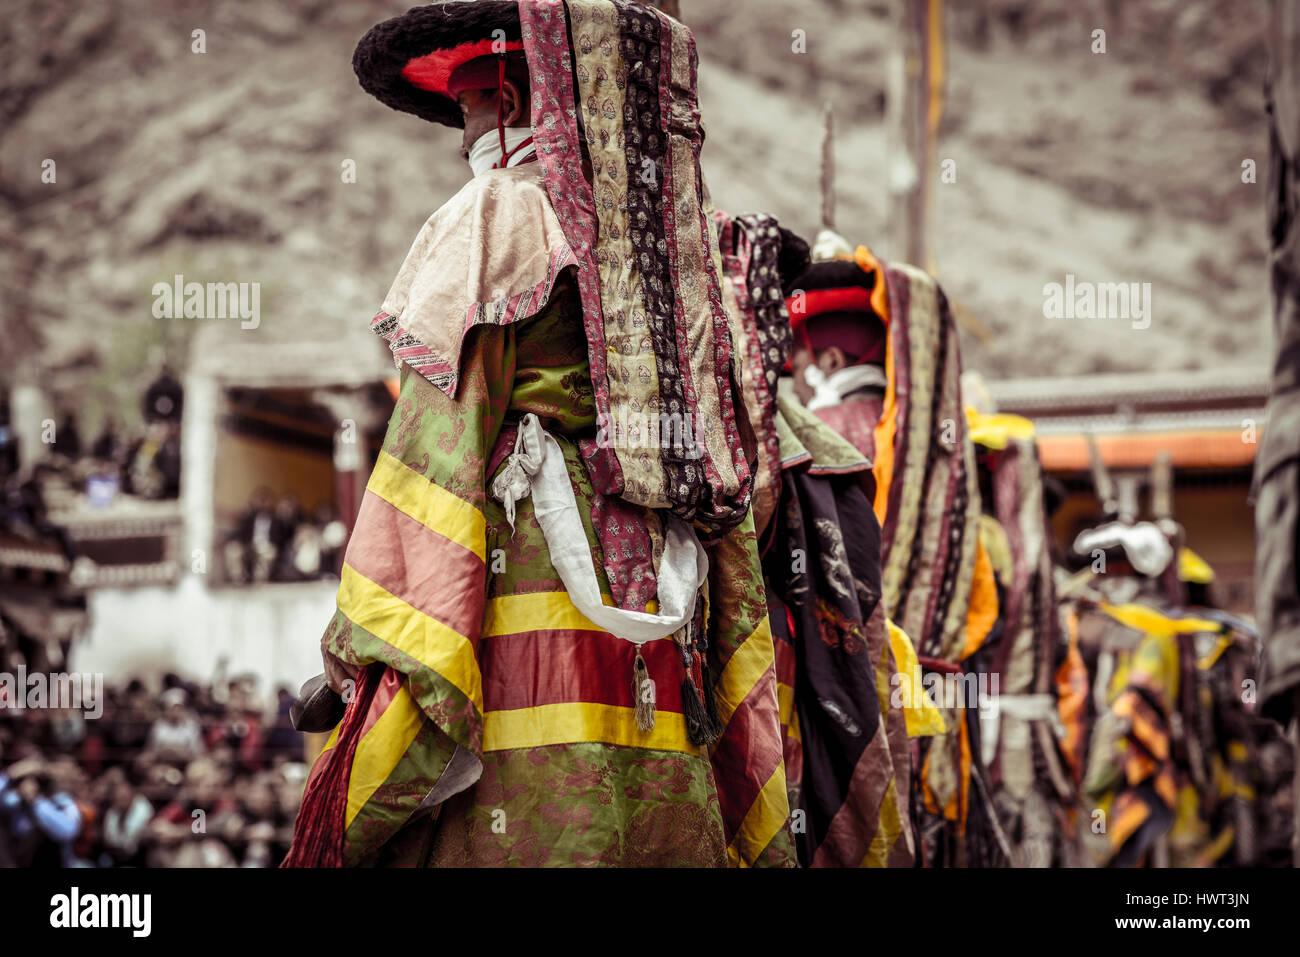 Traditionelle Tänzer am Feld stehen Stockbild